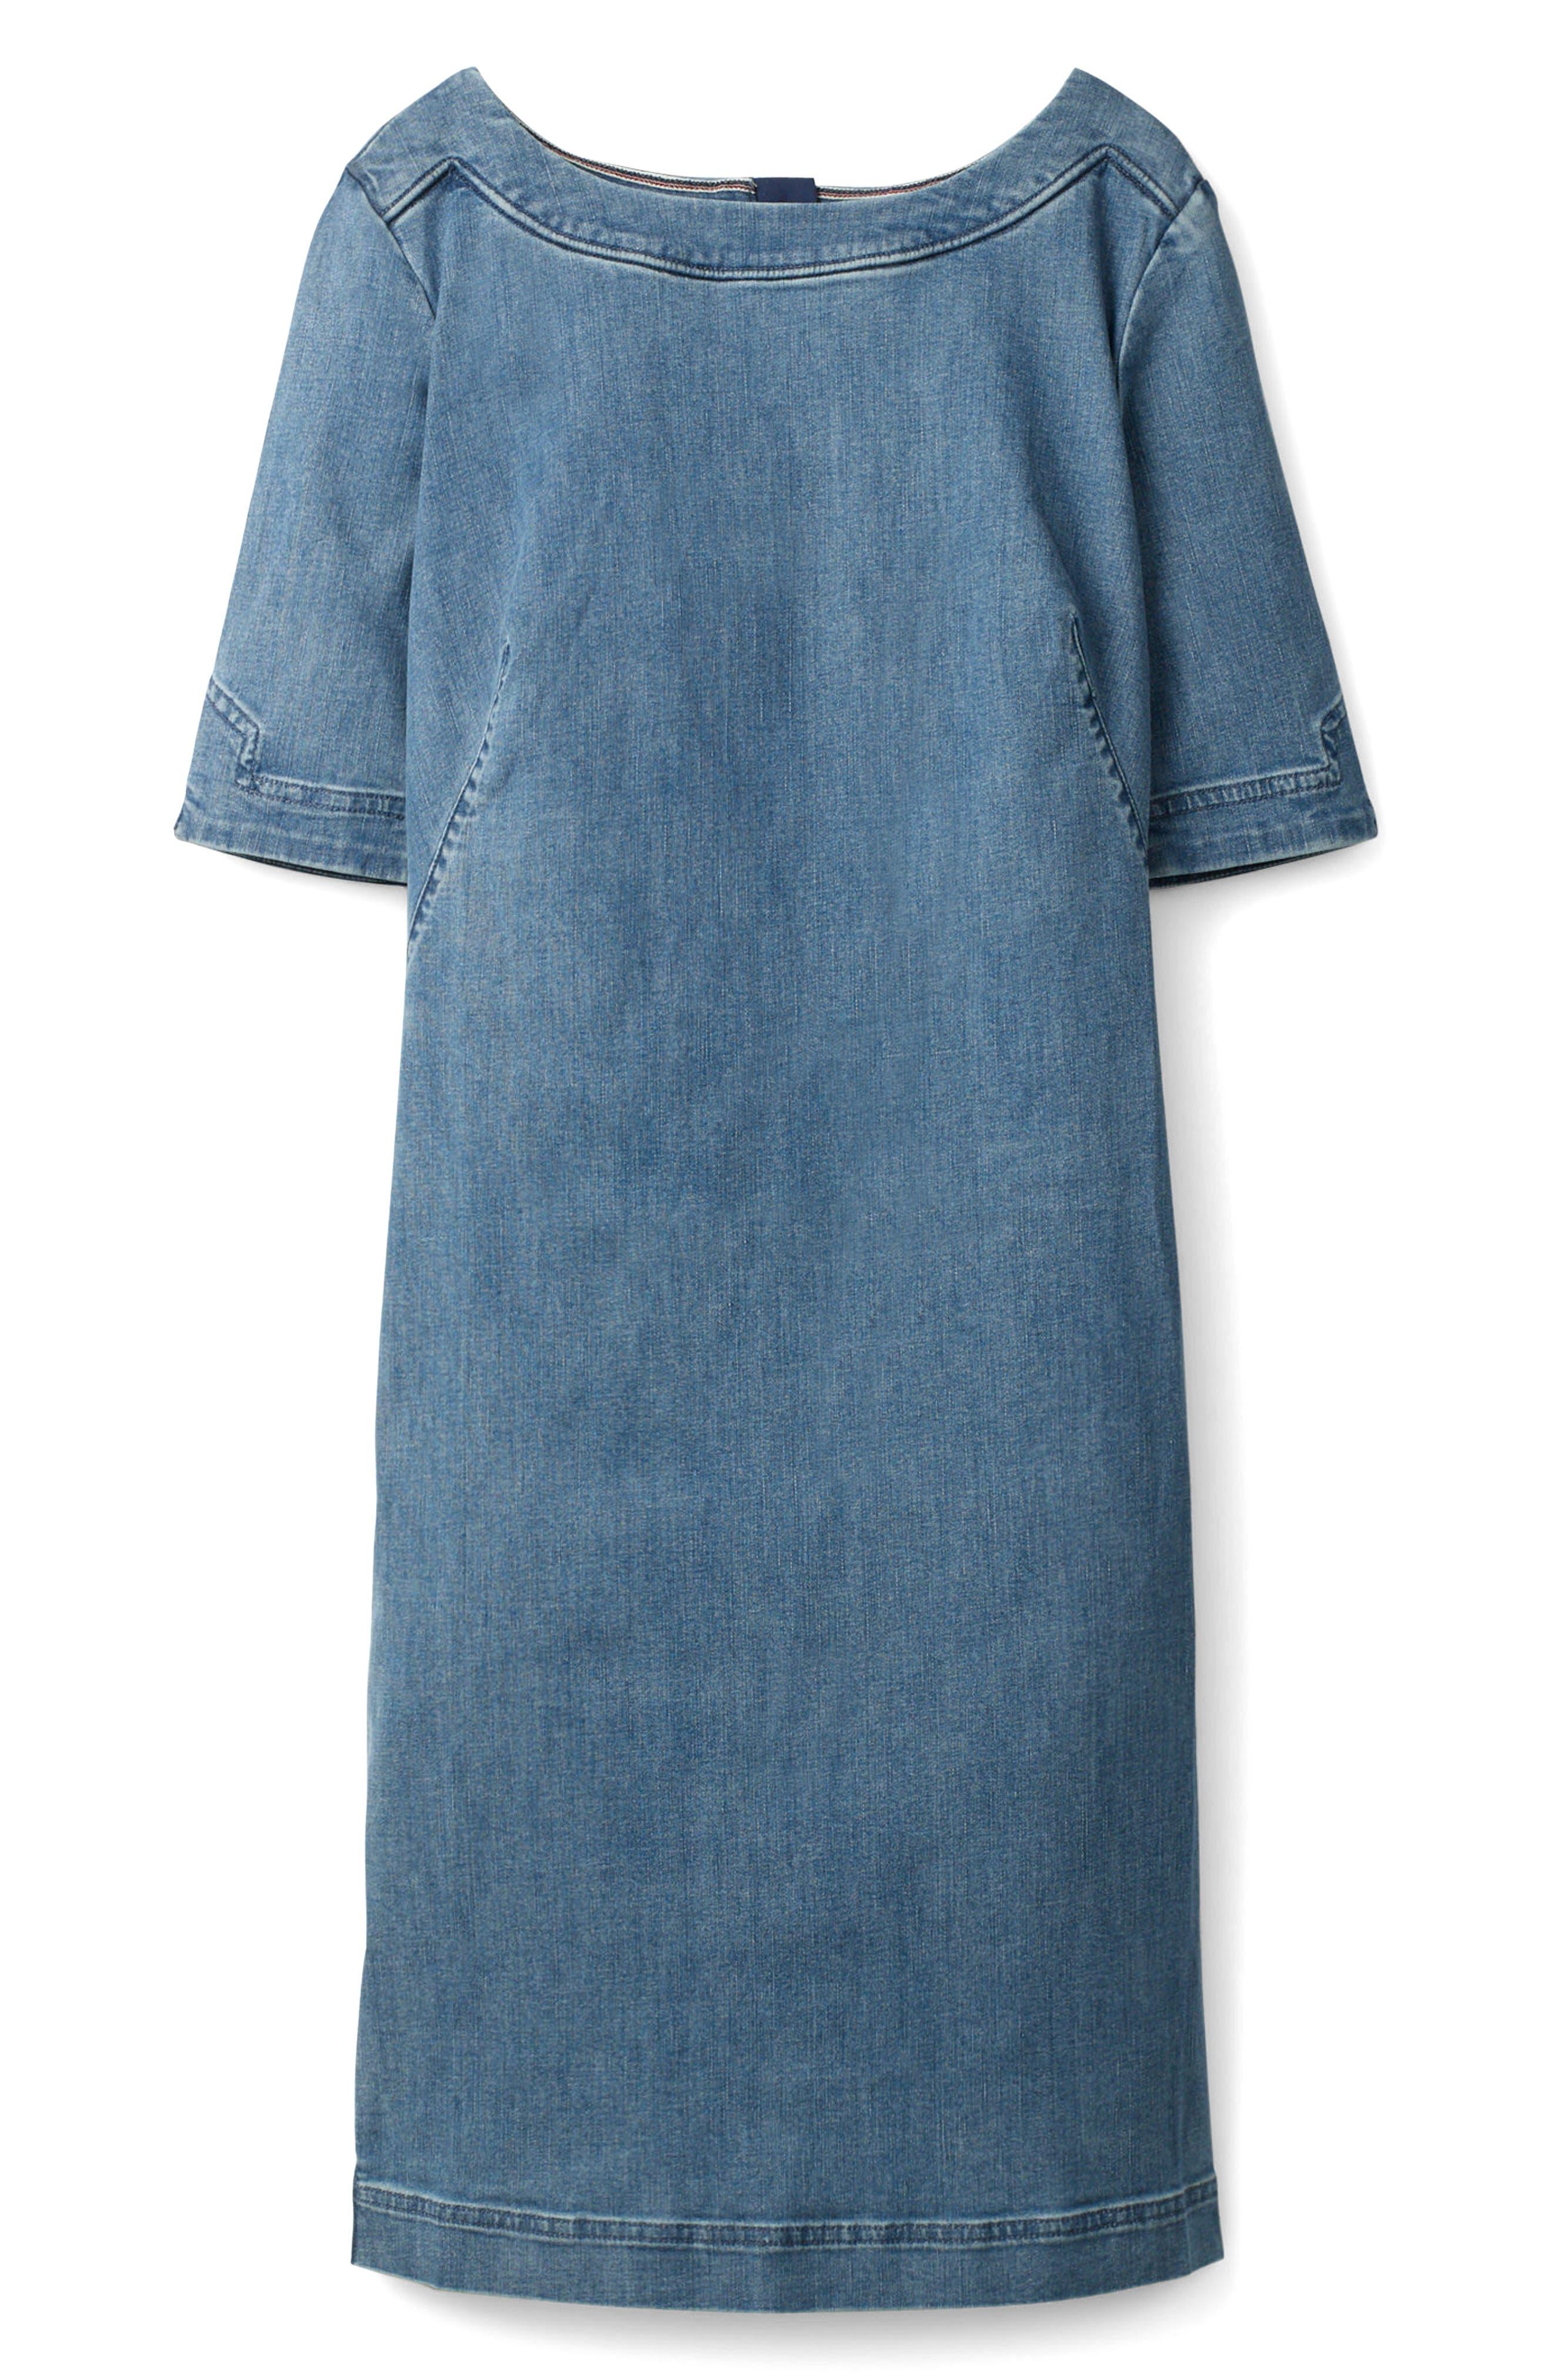 Rhea Denim Contrast Dress,                             Alternate thumbnail 5, color,                             MID VINTAGE WITH SIDE STRIPE